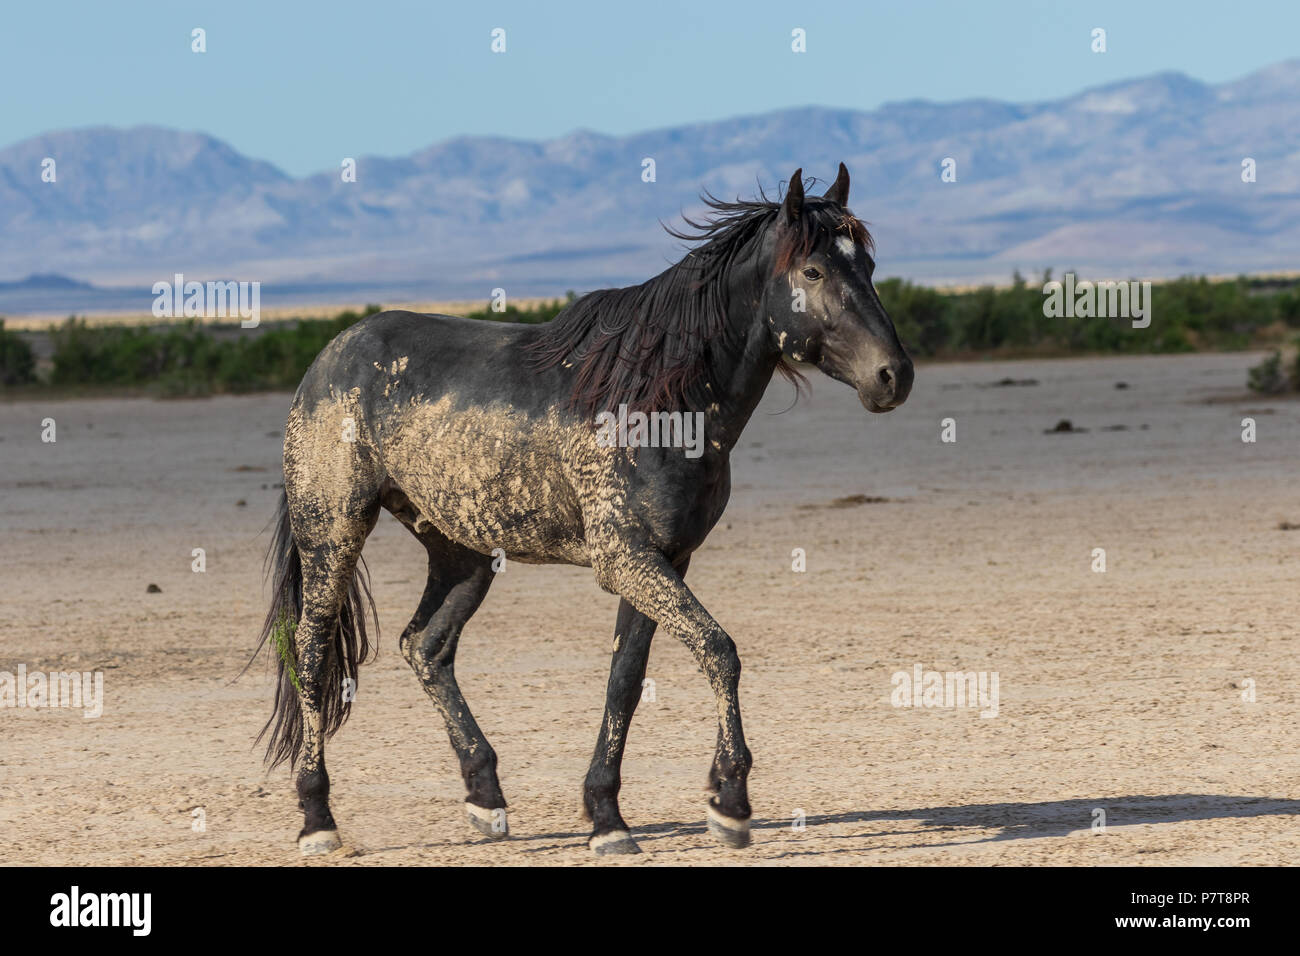 Wild Horse Stallion - Stock Image